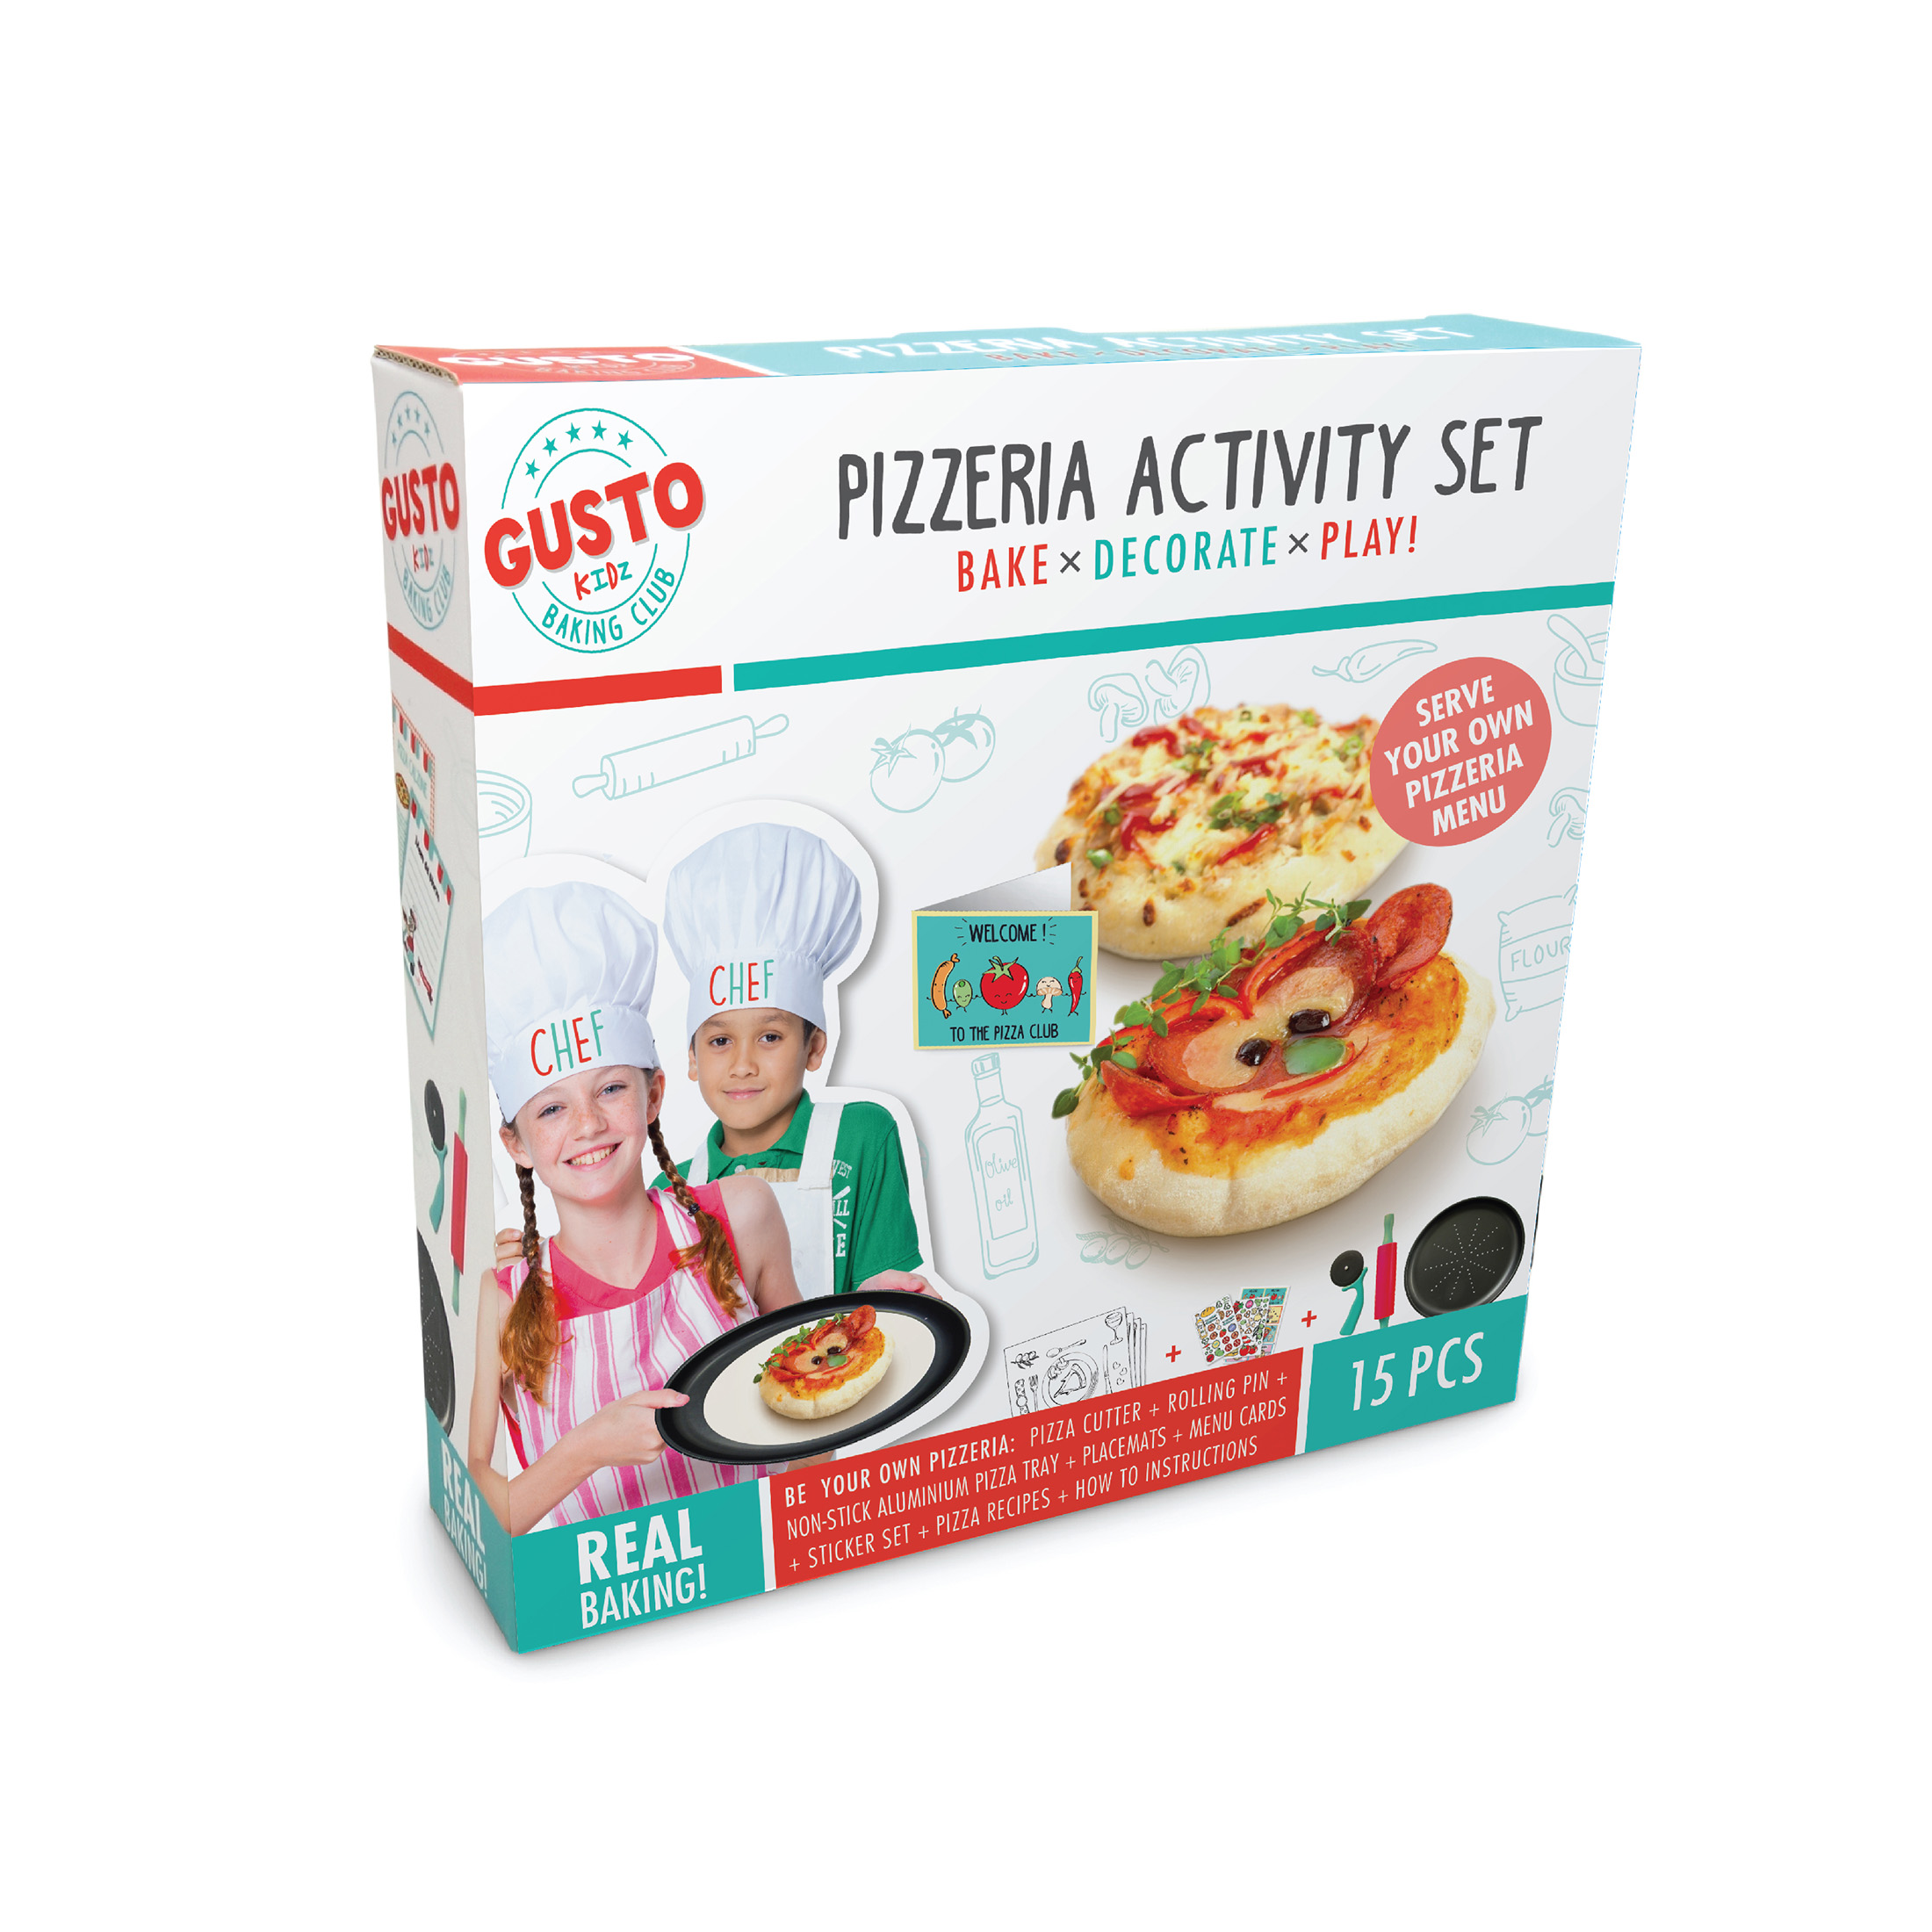 Gusto Pizzeria Activity Set - Bake, Decorate, Play